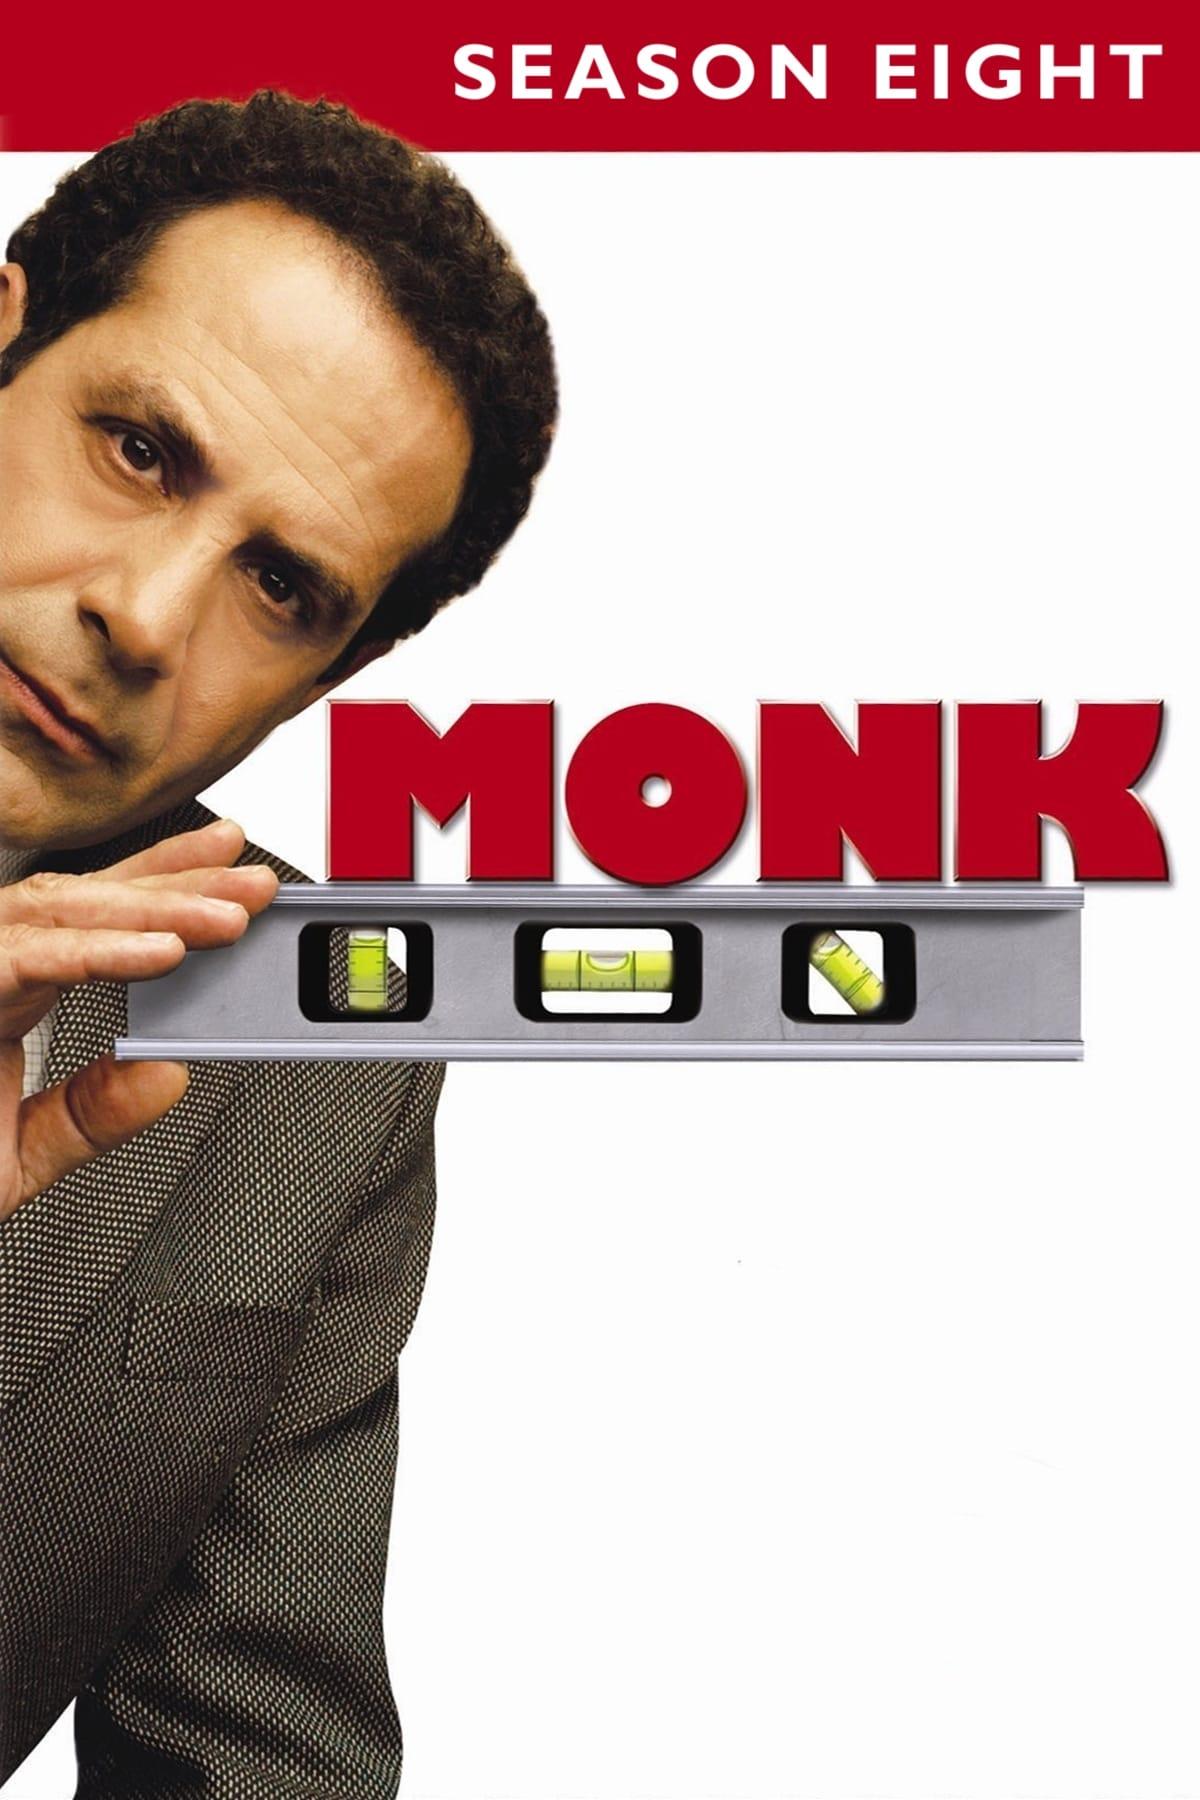 Monk Season 8